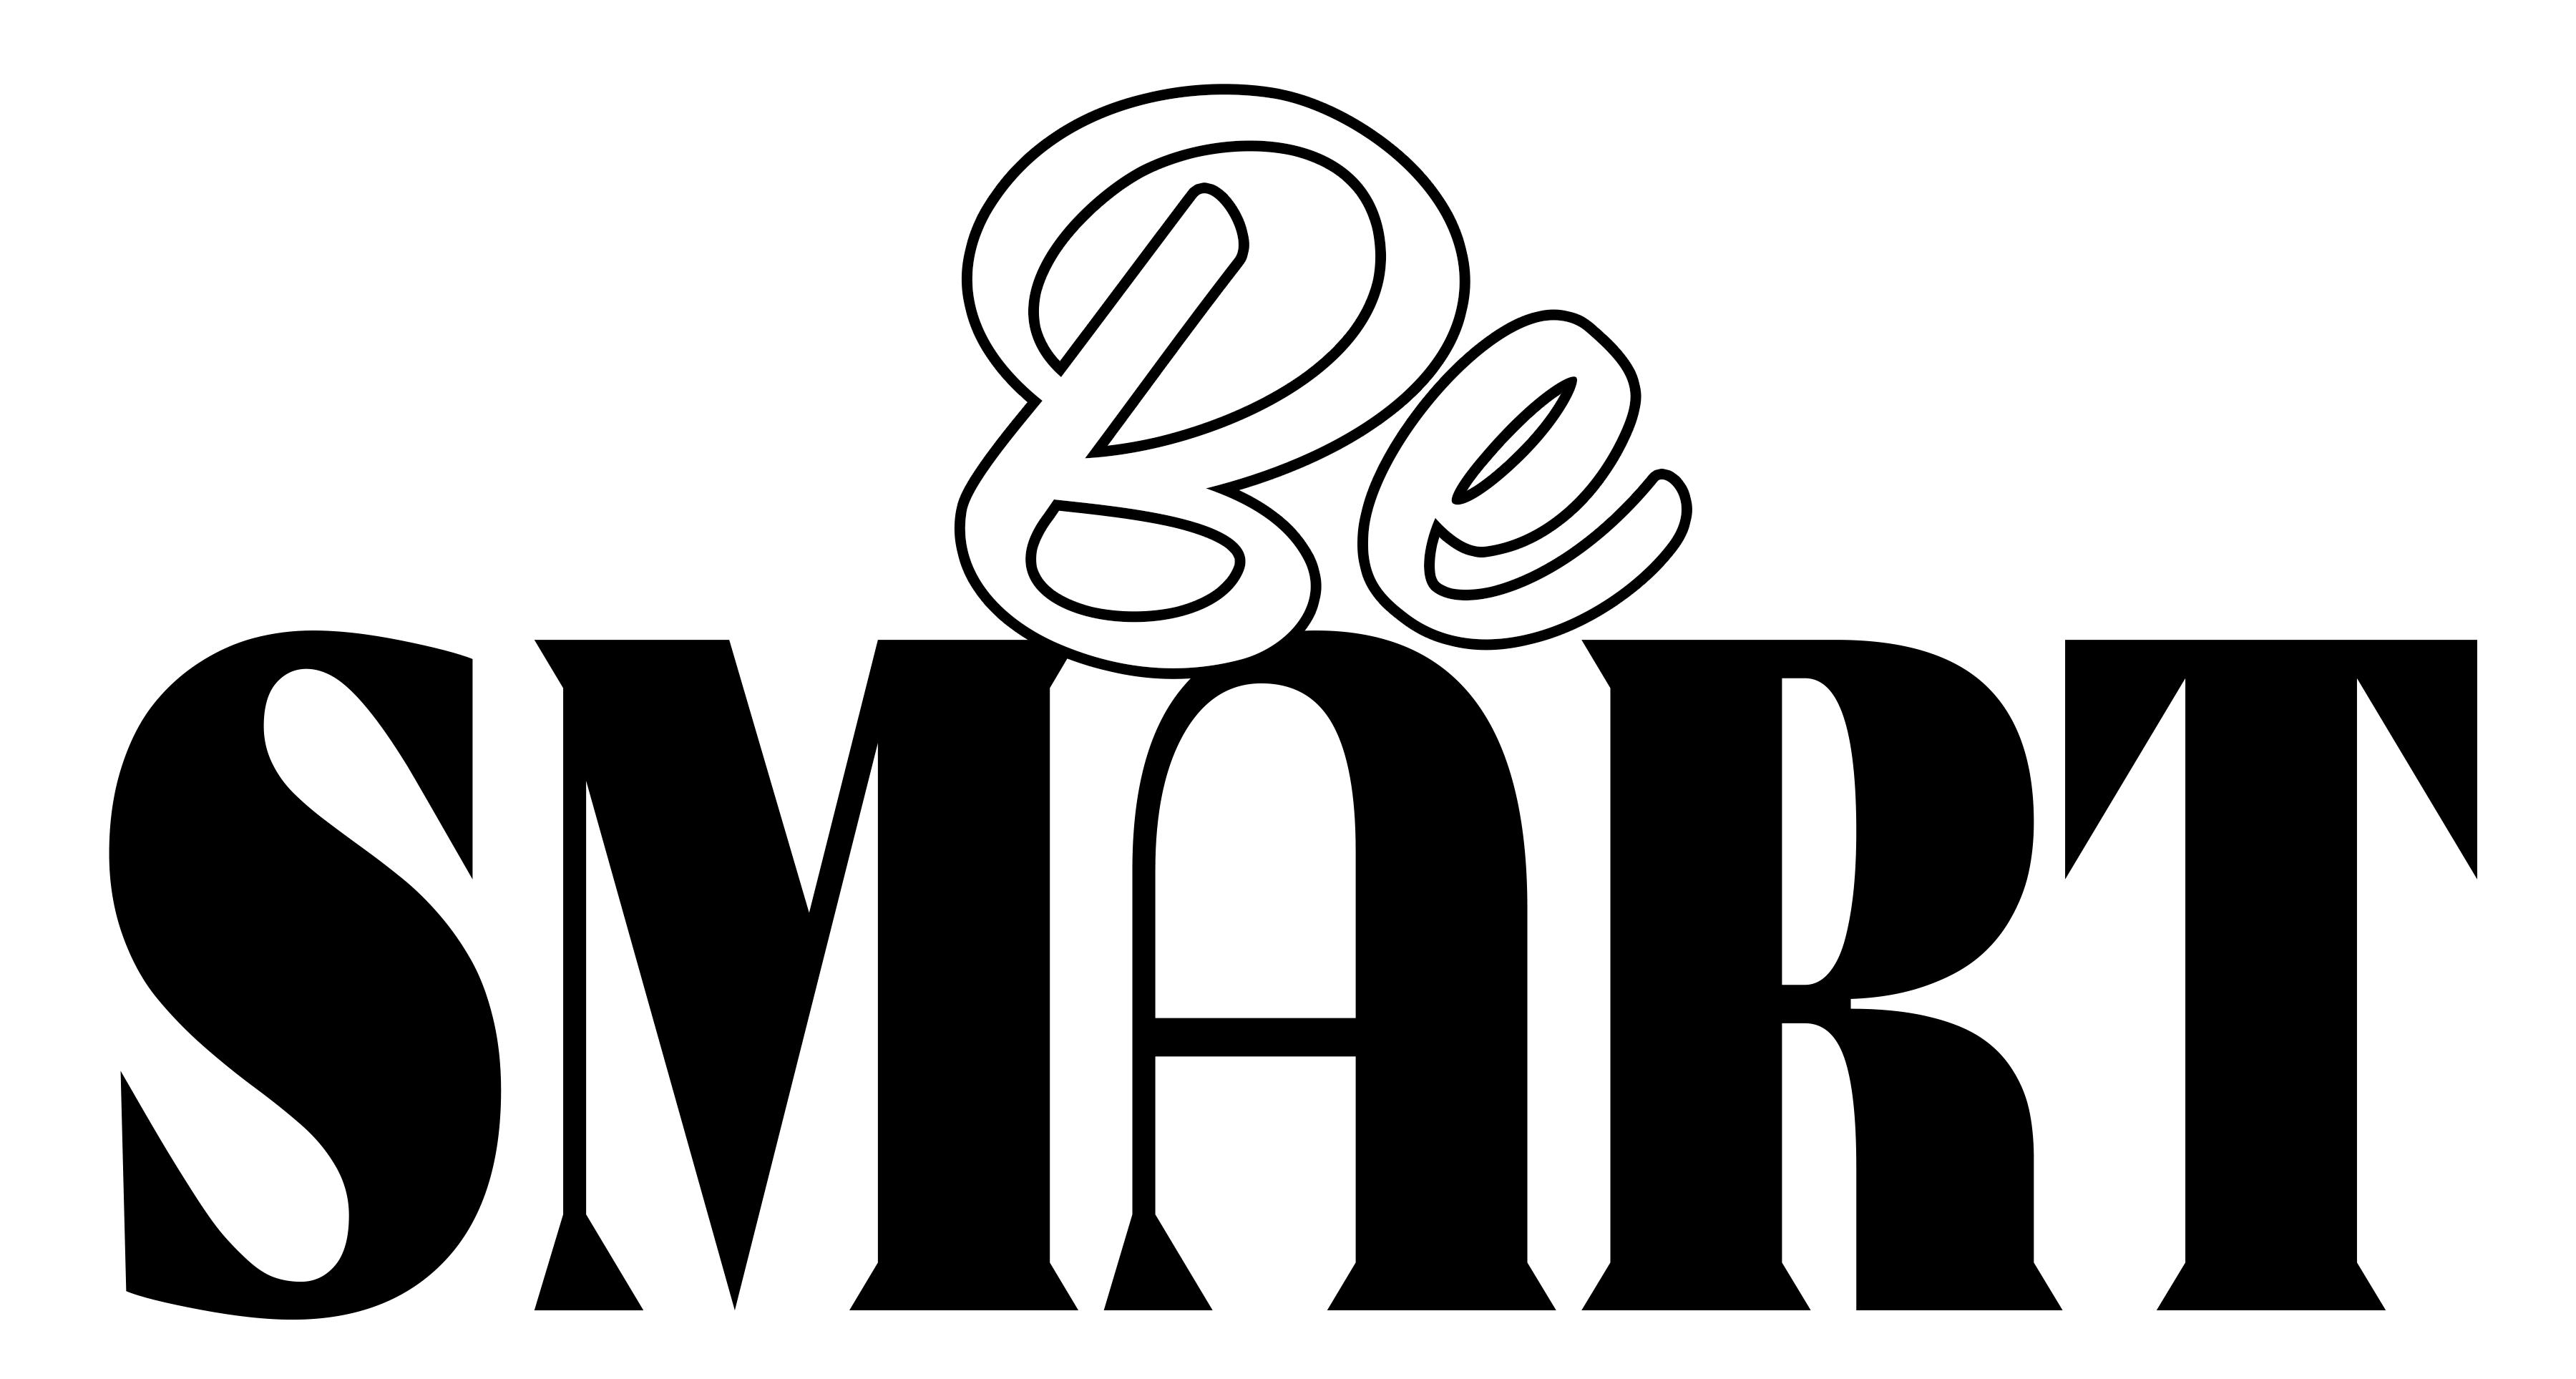 Free Be Smart SVG Cutting File